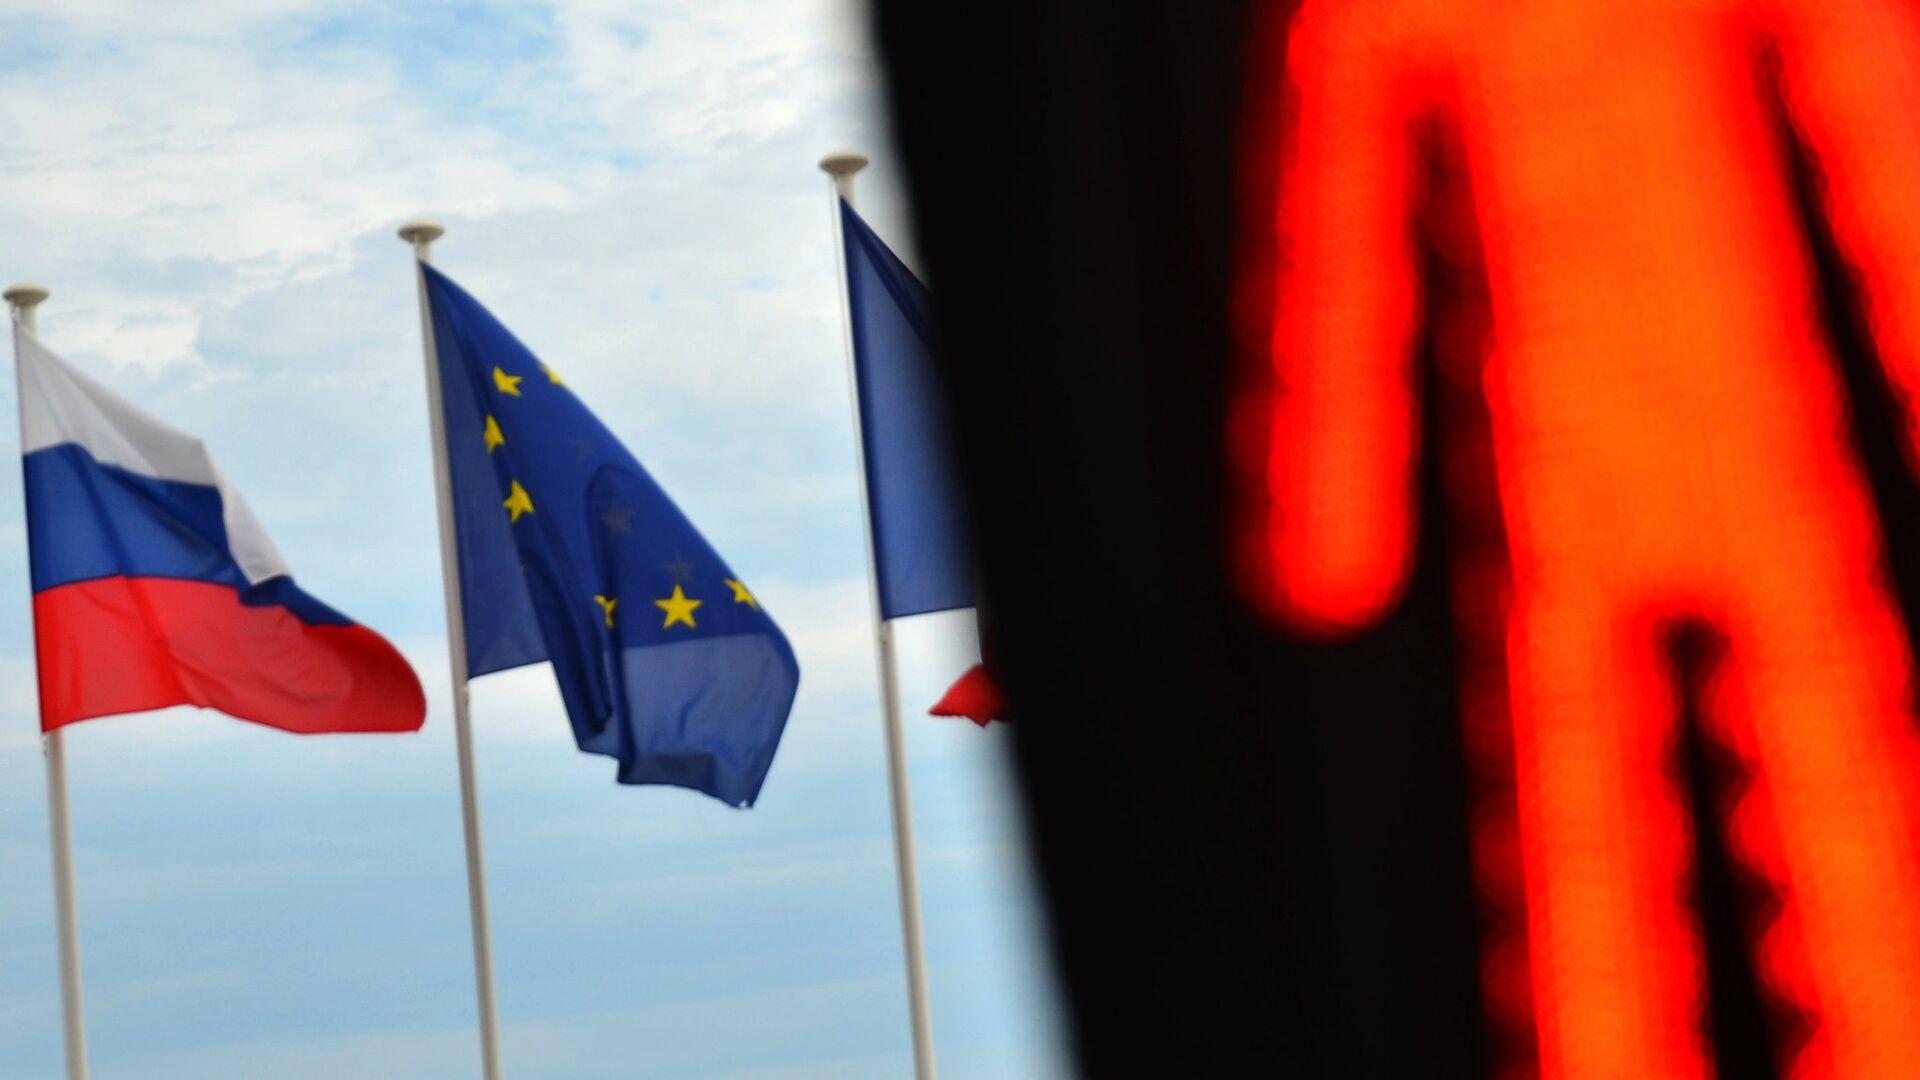 Флаги России, ЕС и Франции - РИА Новости, 1920, 30.05.2021